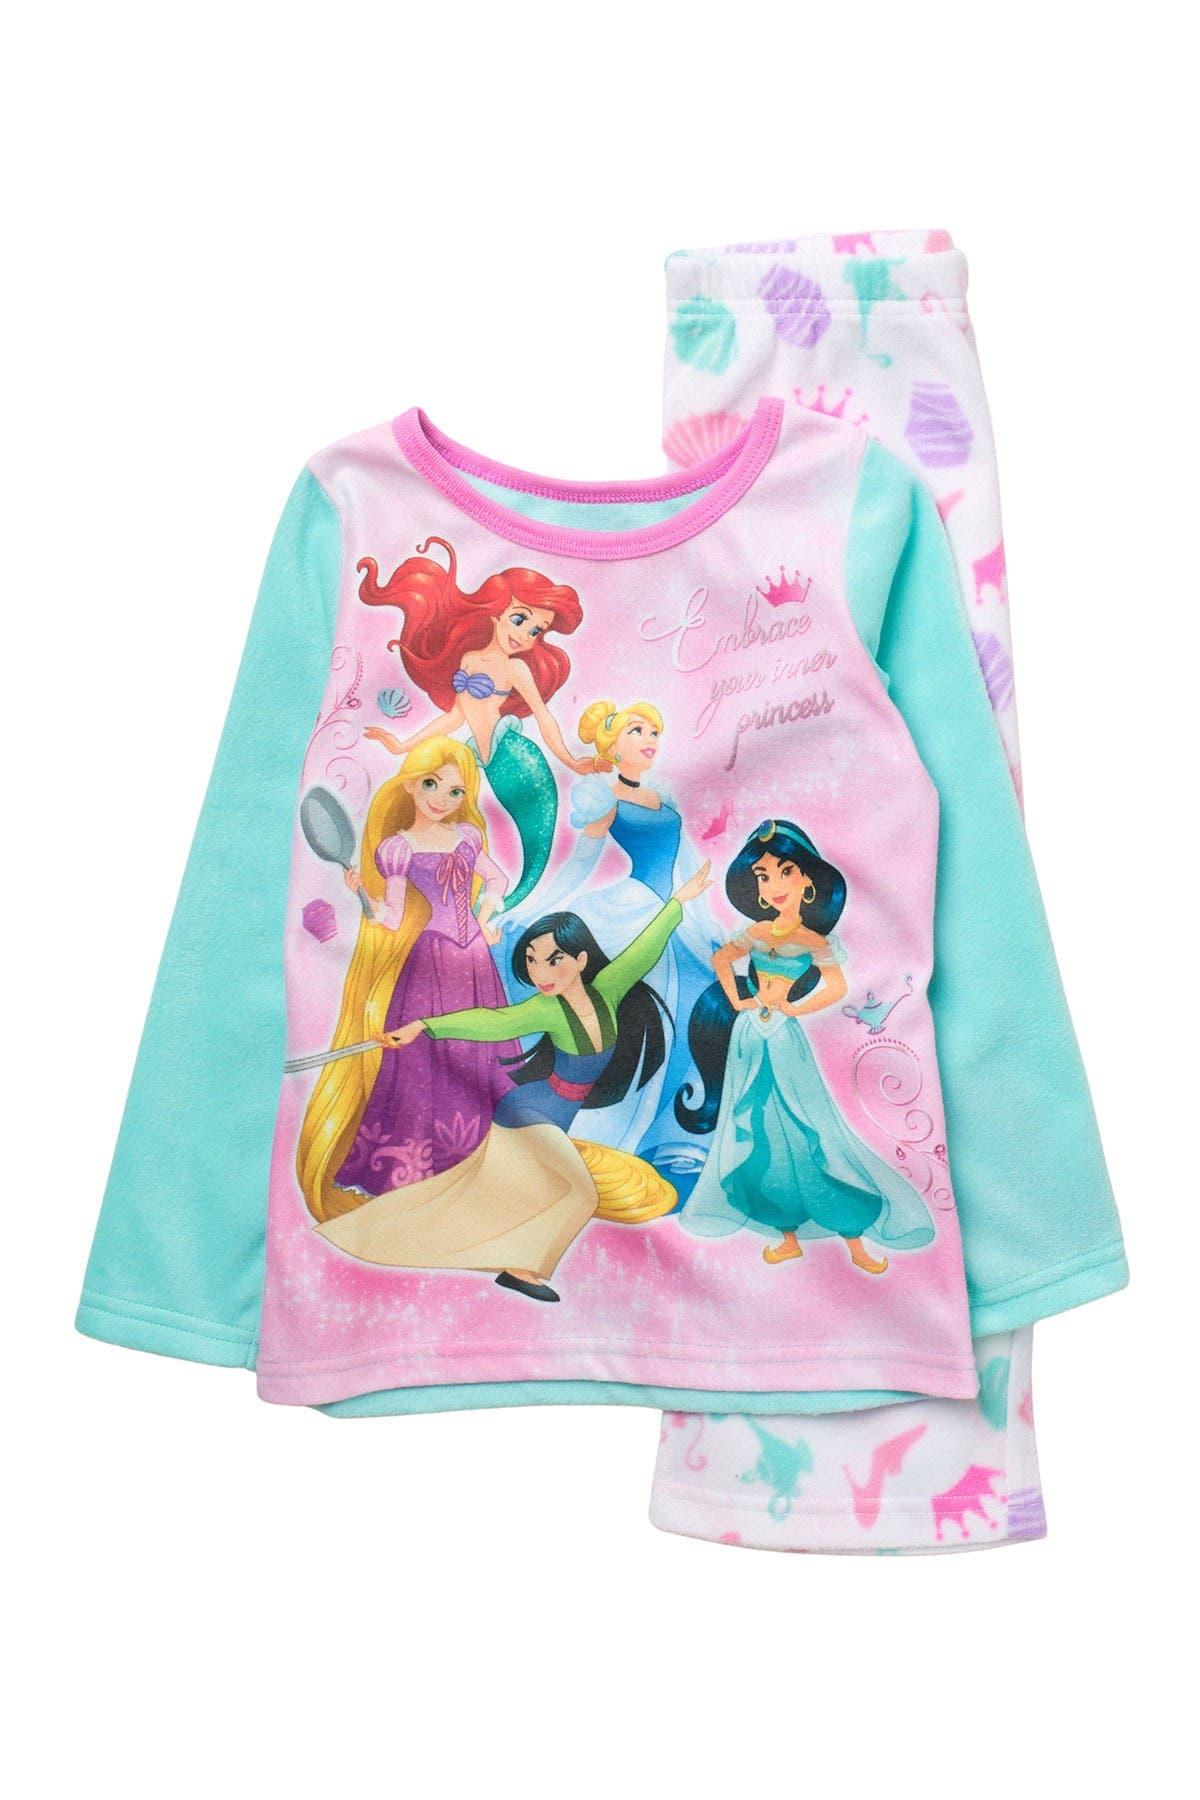 Image of AME Princess Top & Bottoms Pajama Set